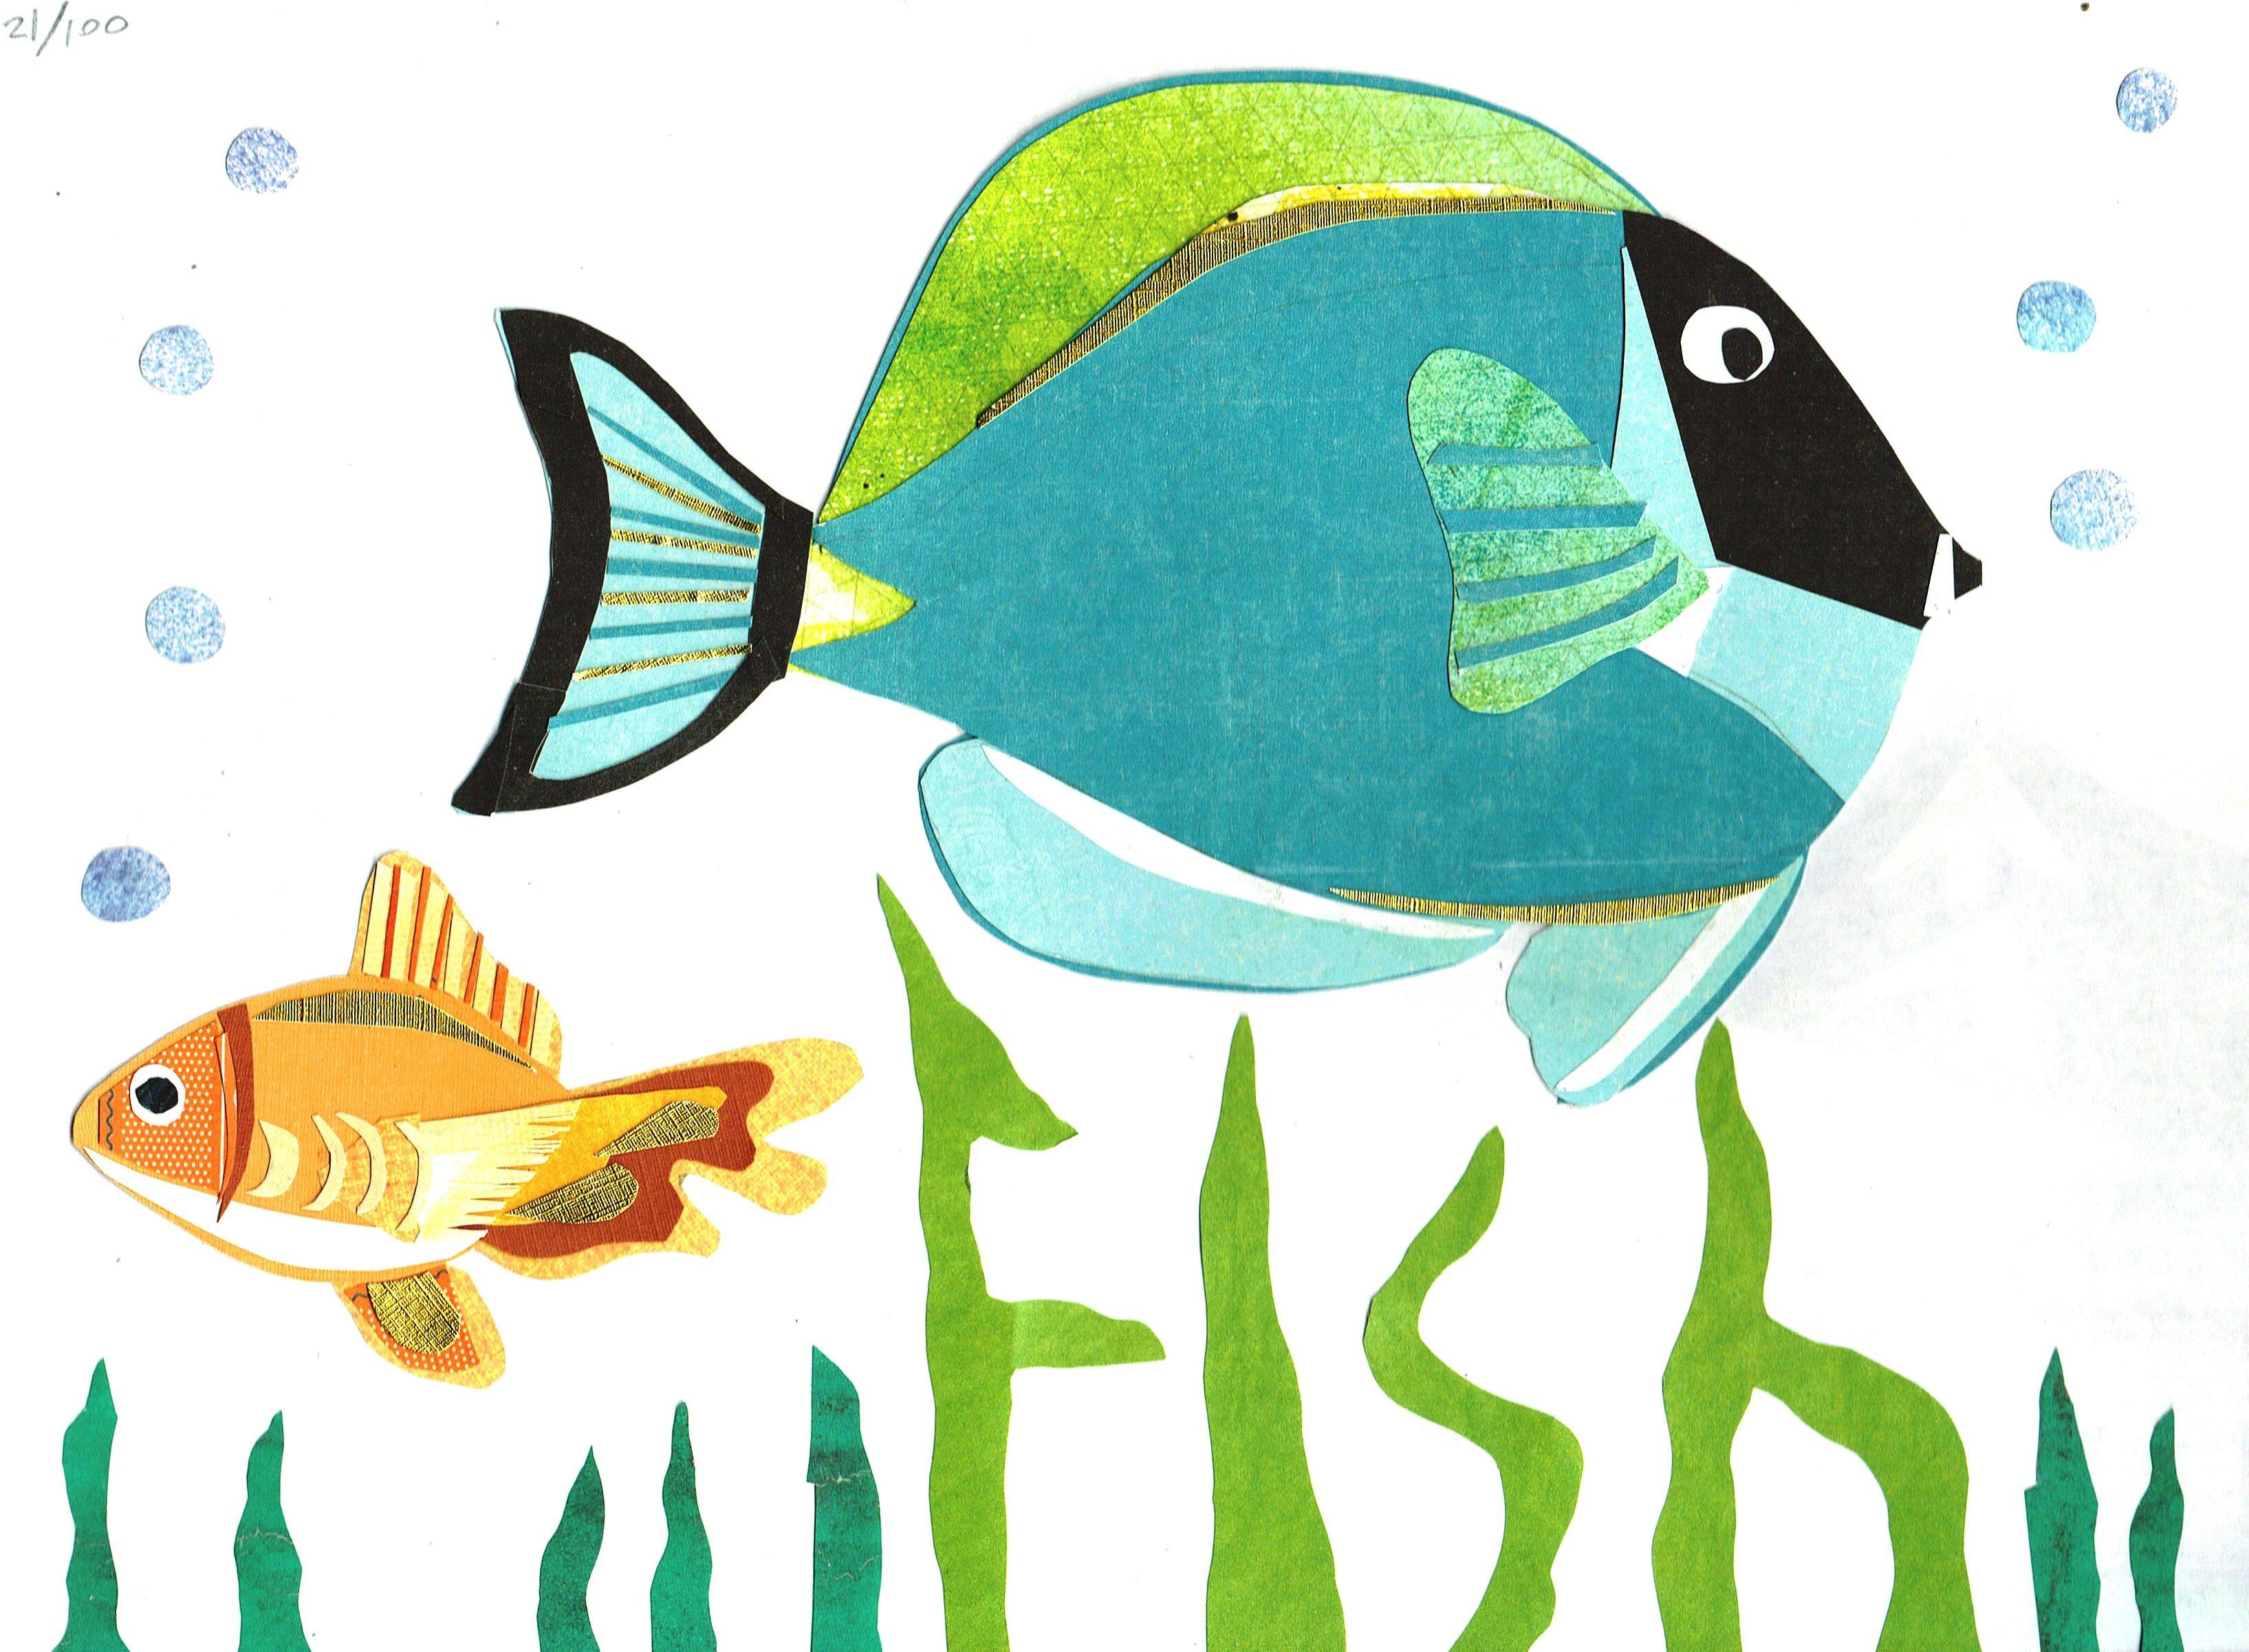 Day 21 - Fish